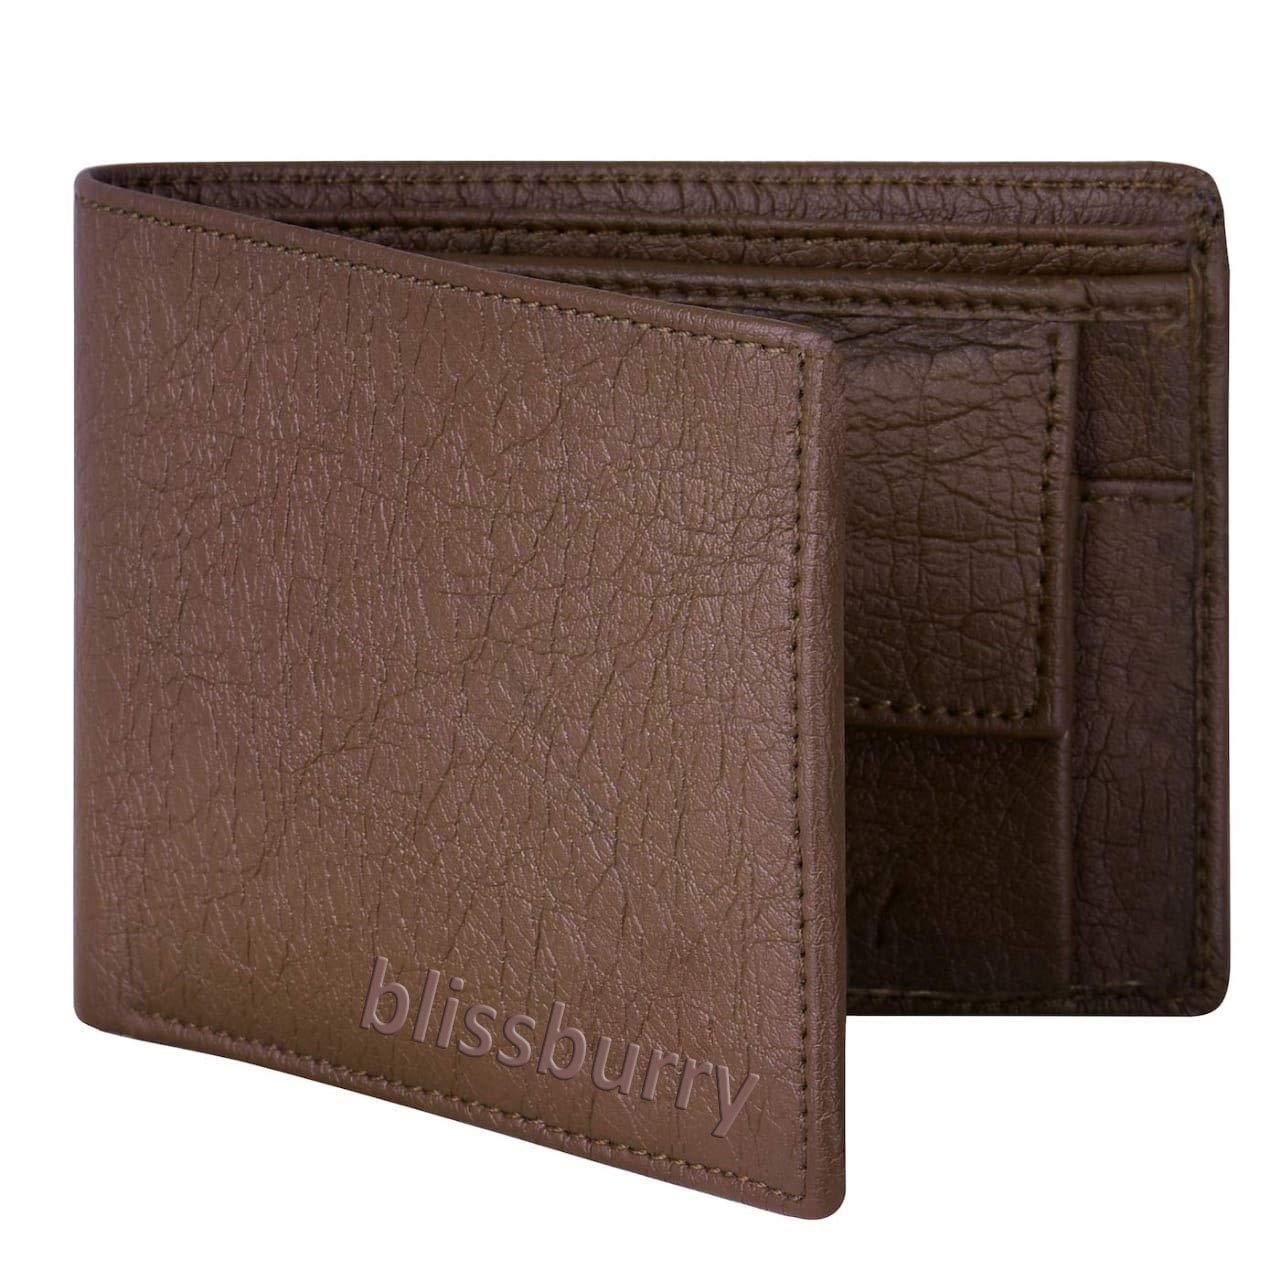 Blissburry Leather Wallet for Men for ₹199